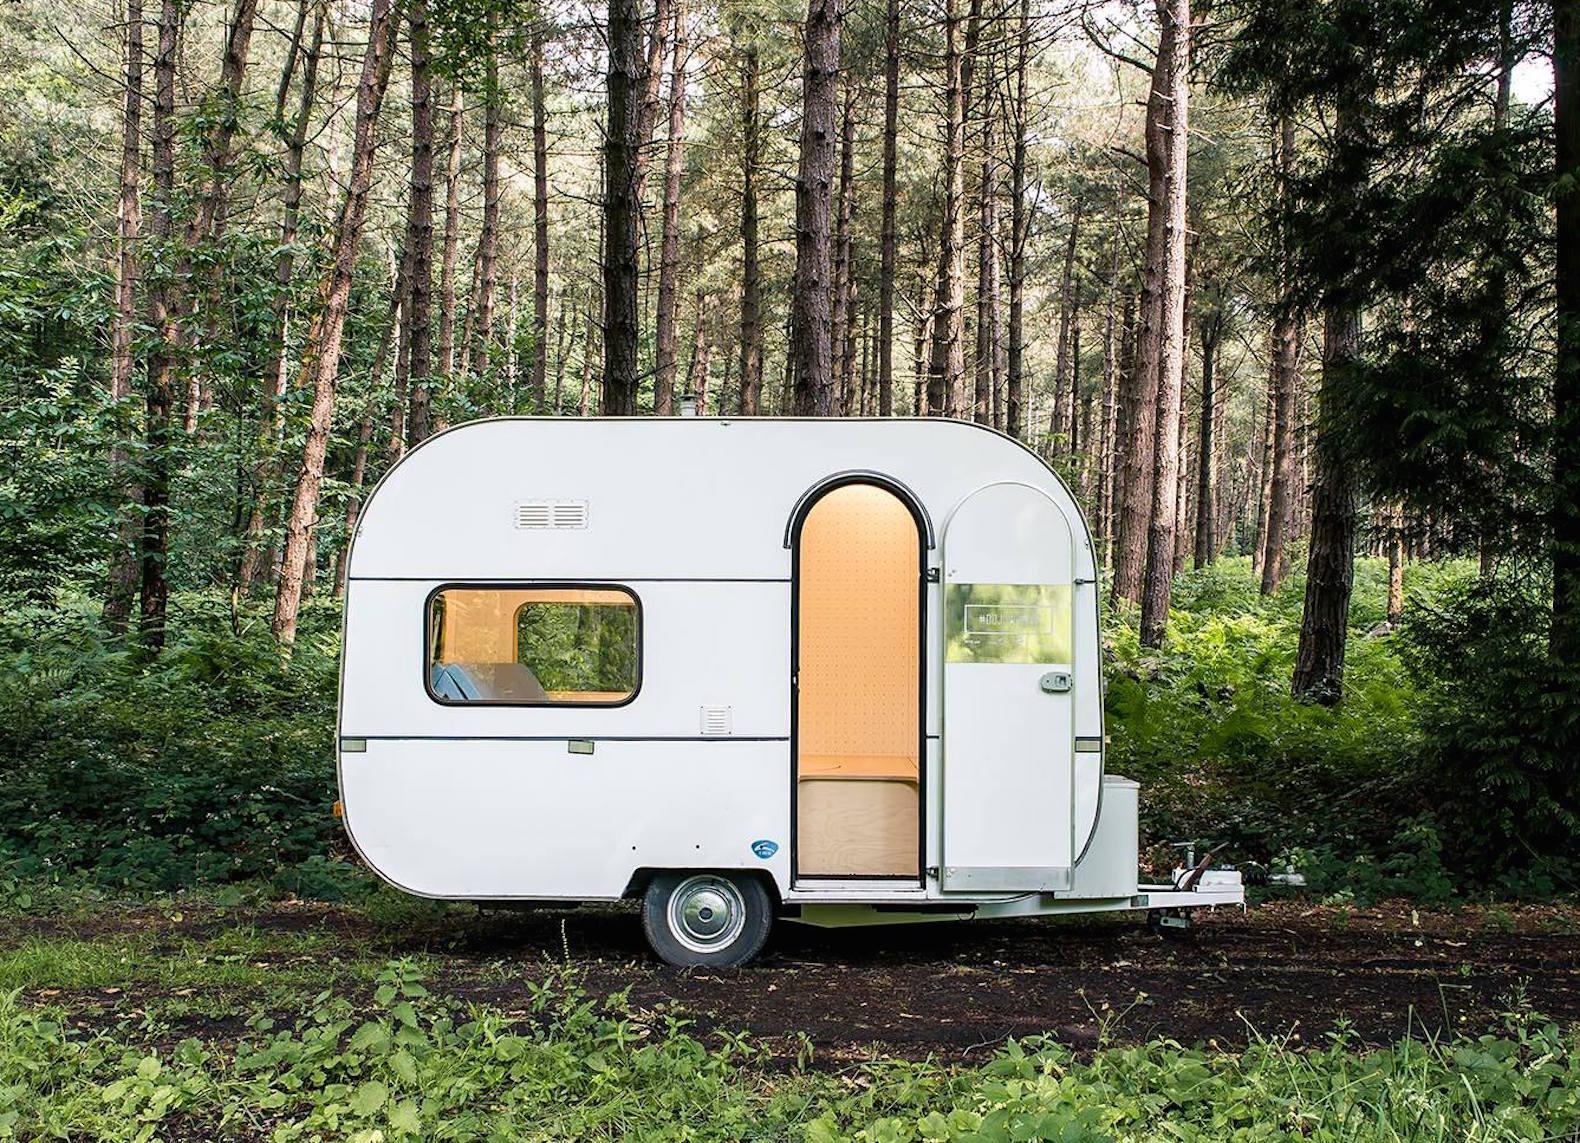 Caravan #2